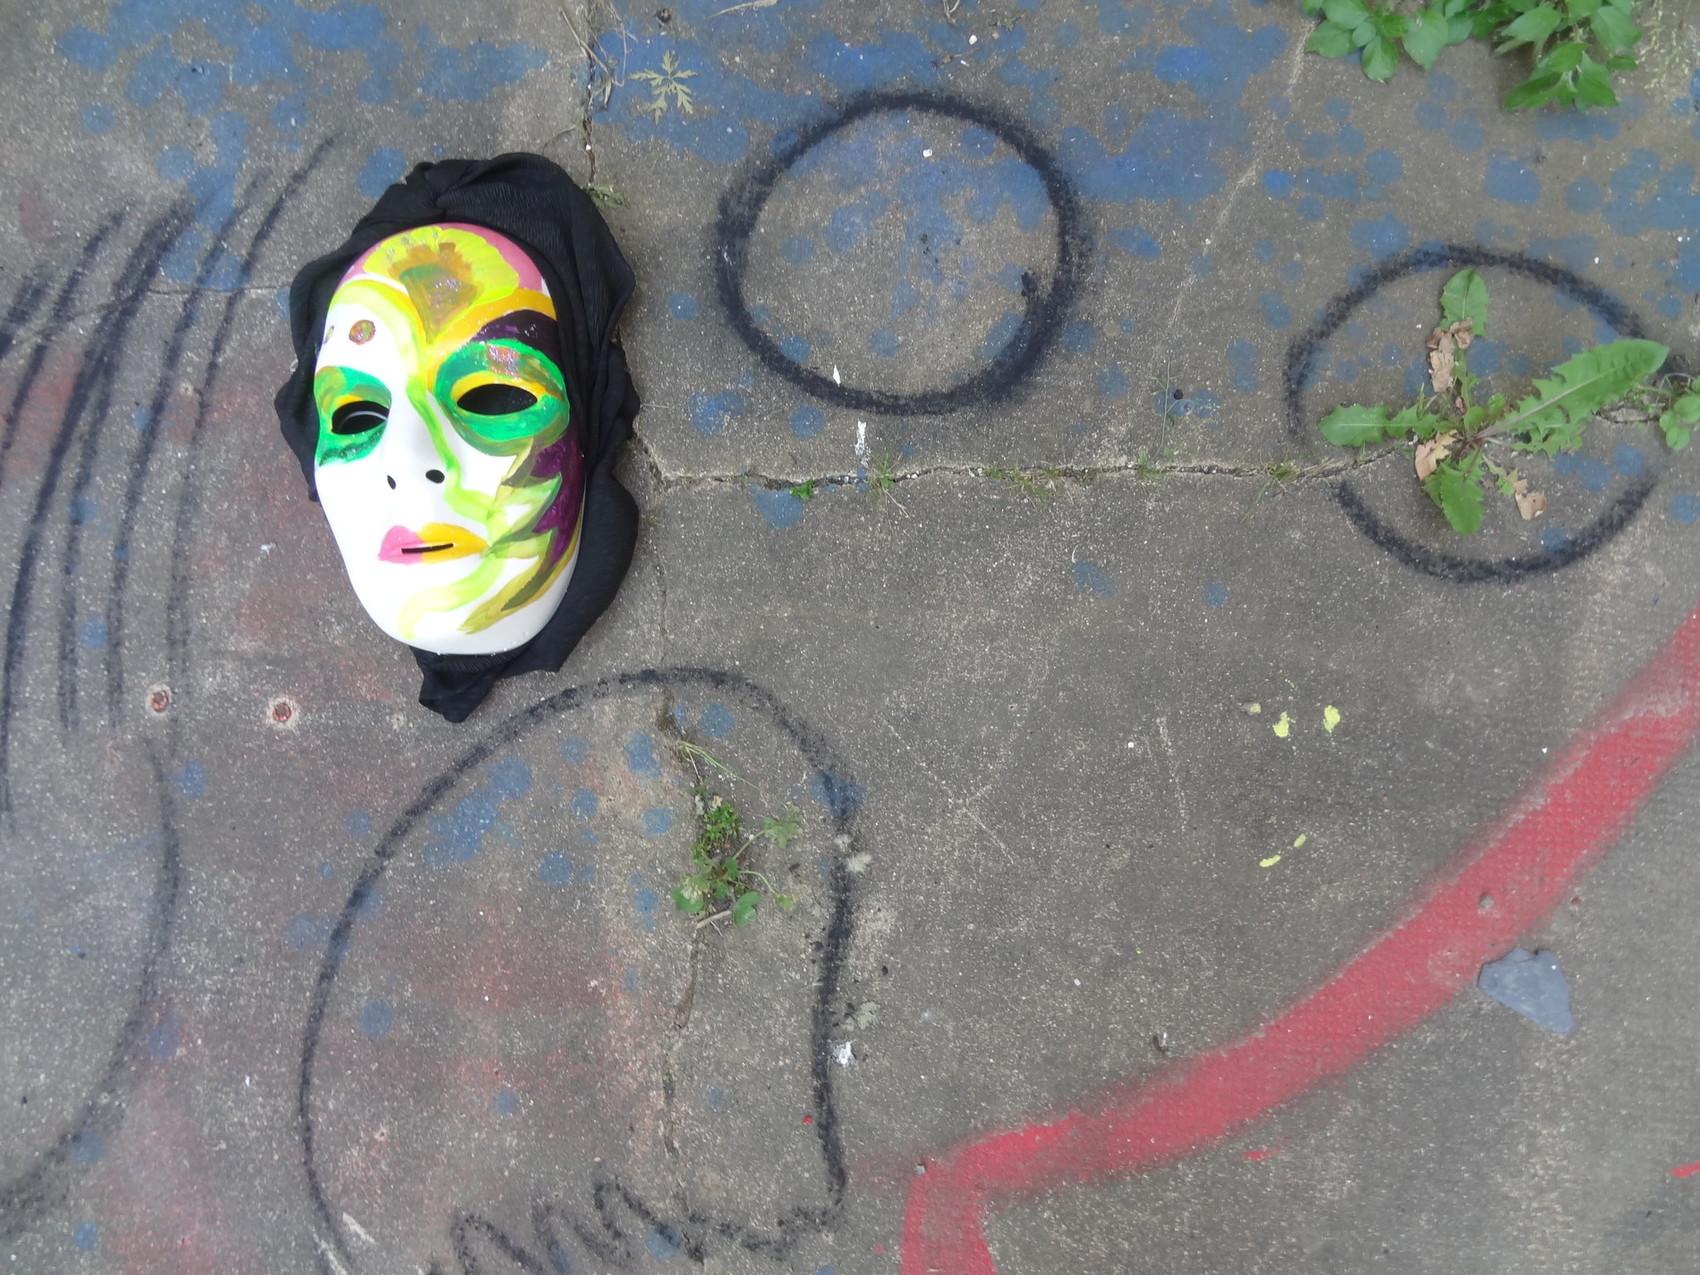 Inspirer l'art par la rue.